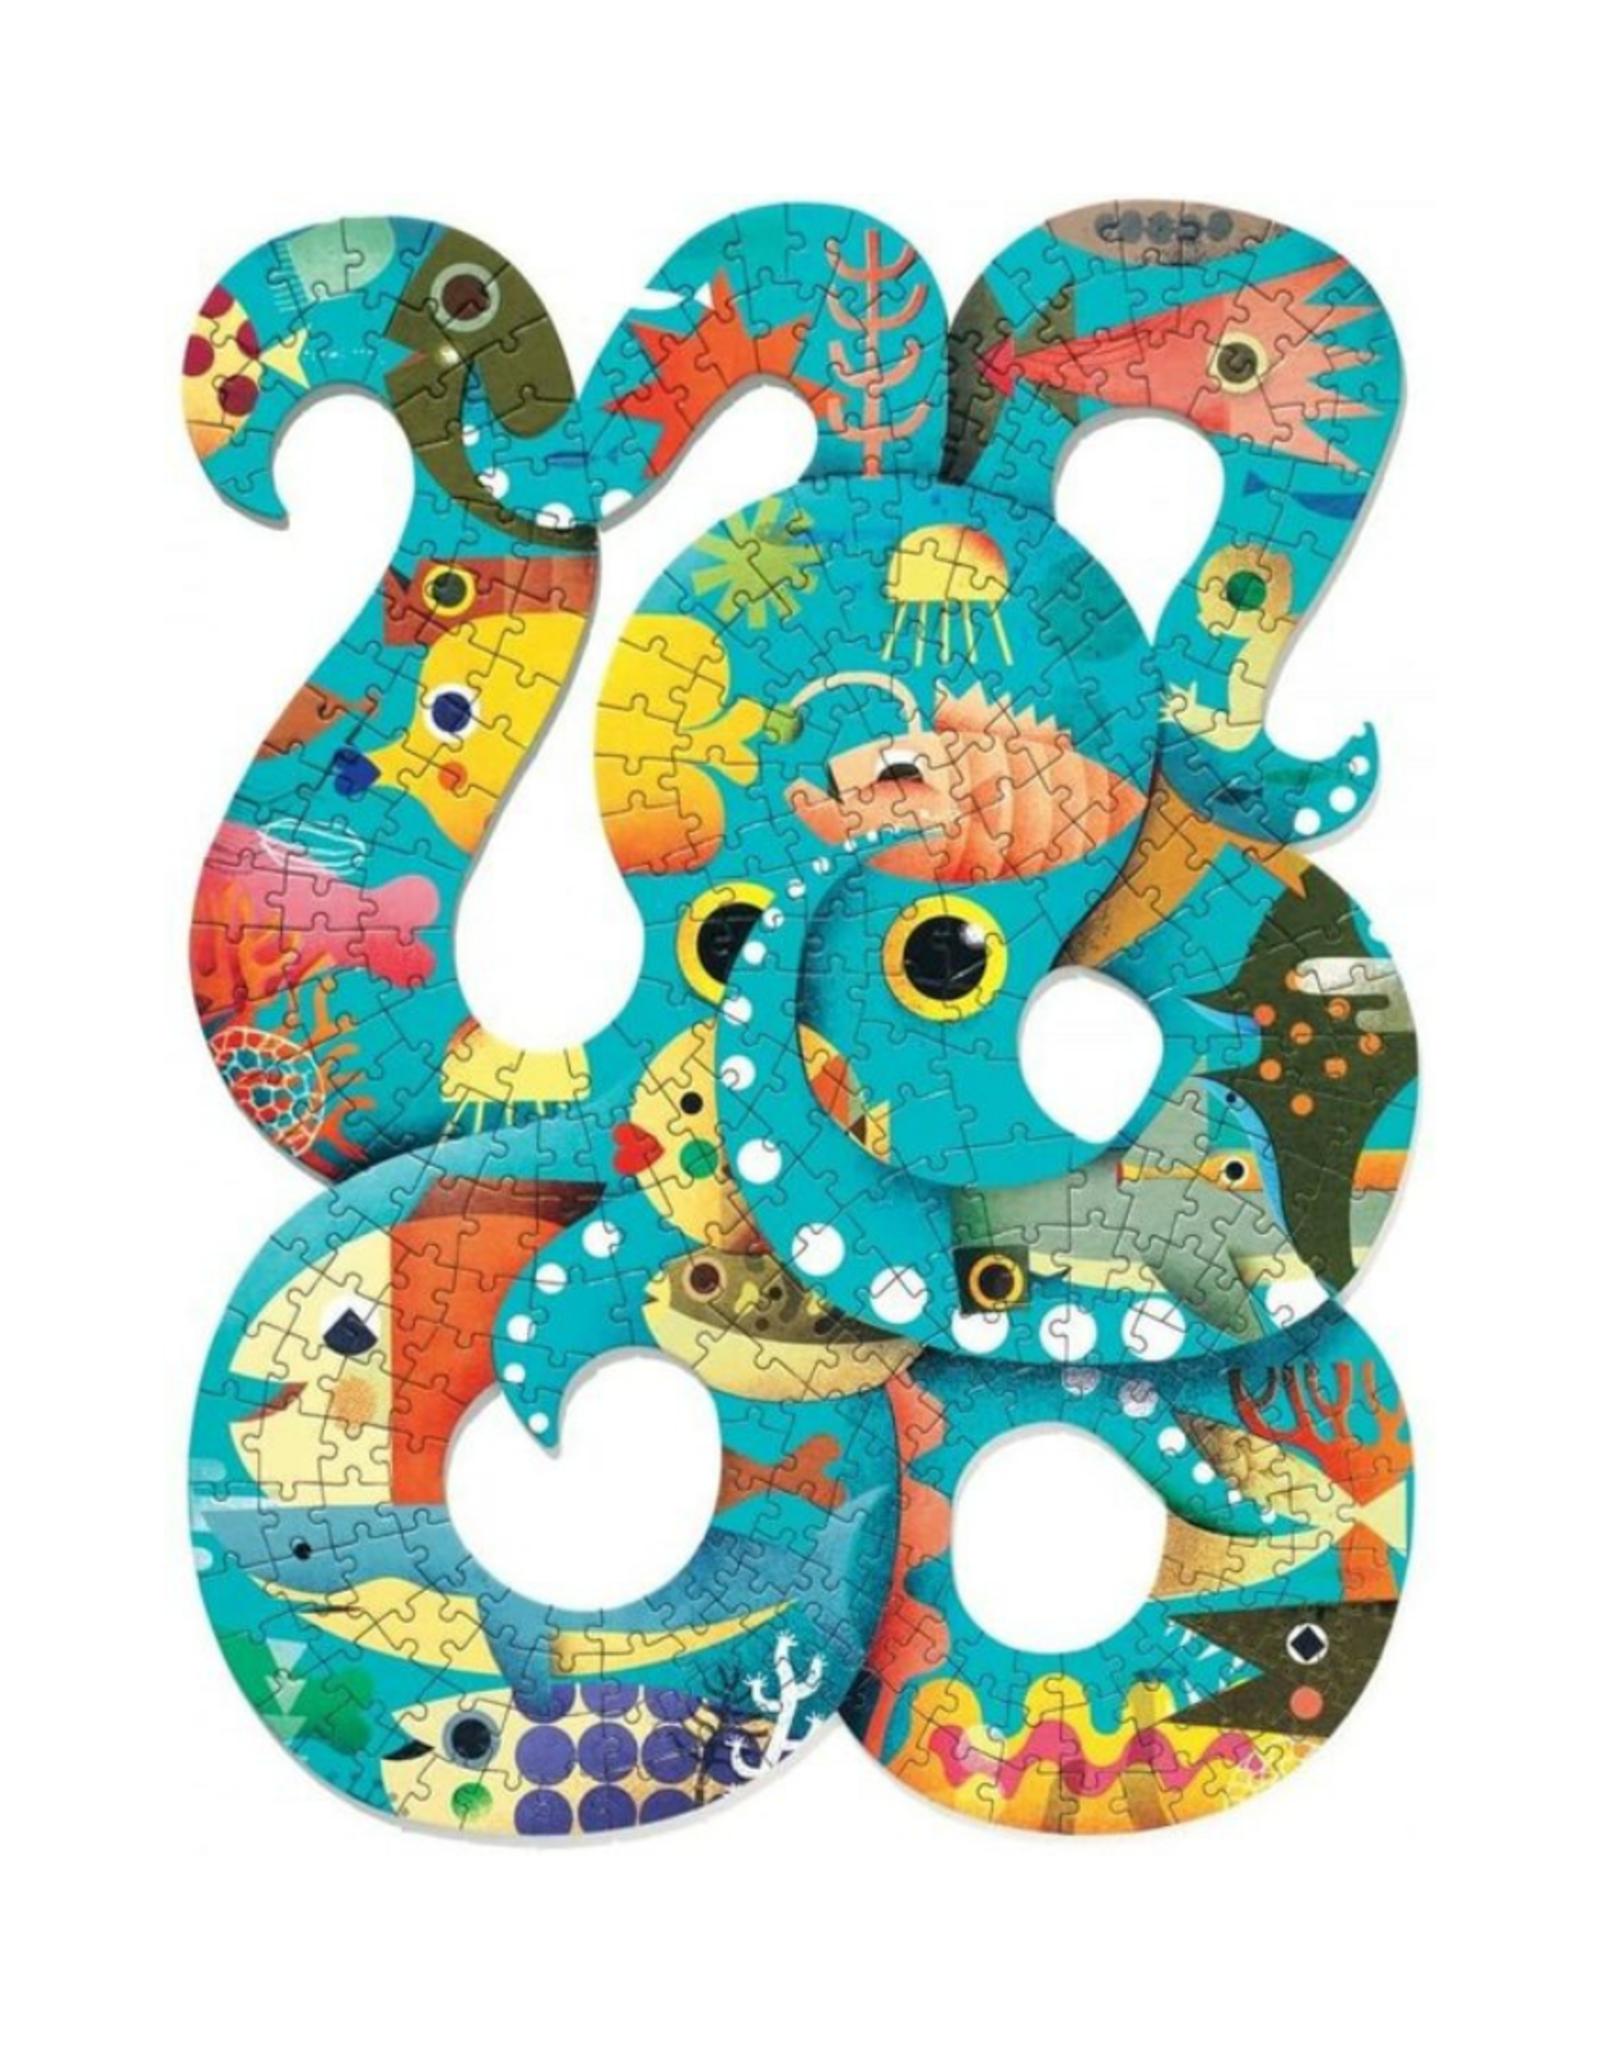 Djeco Puzz'art - Octopus